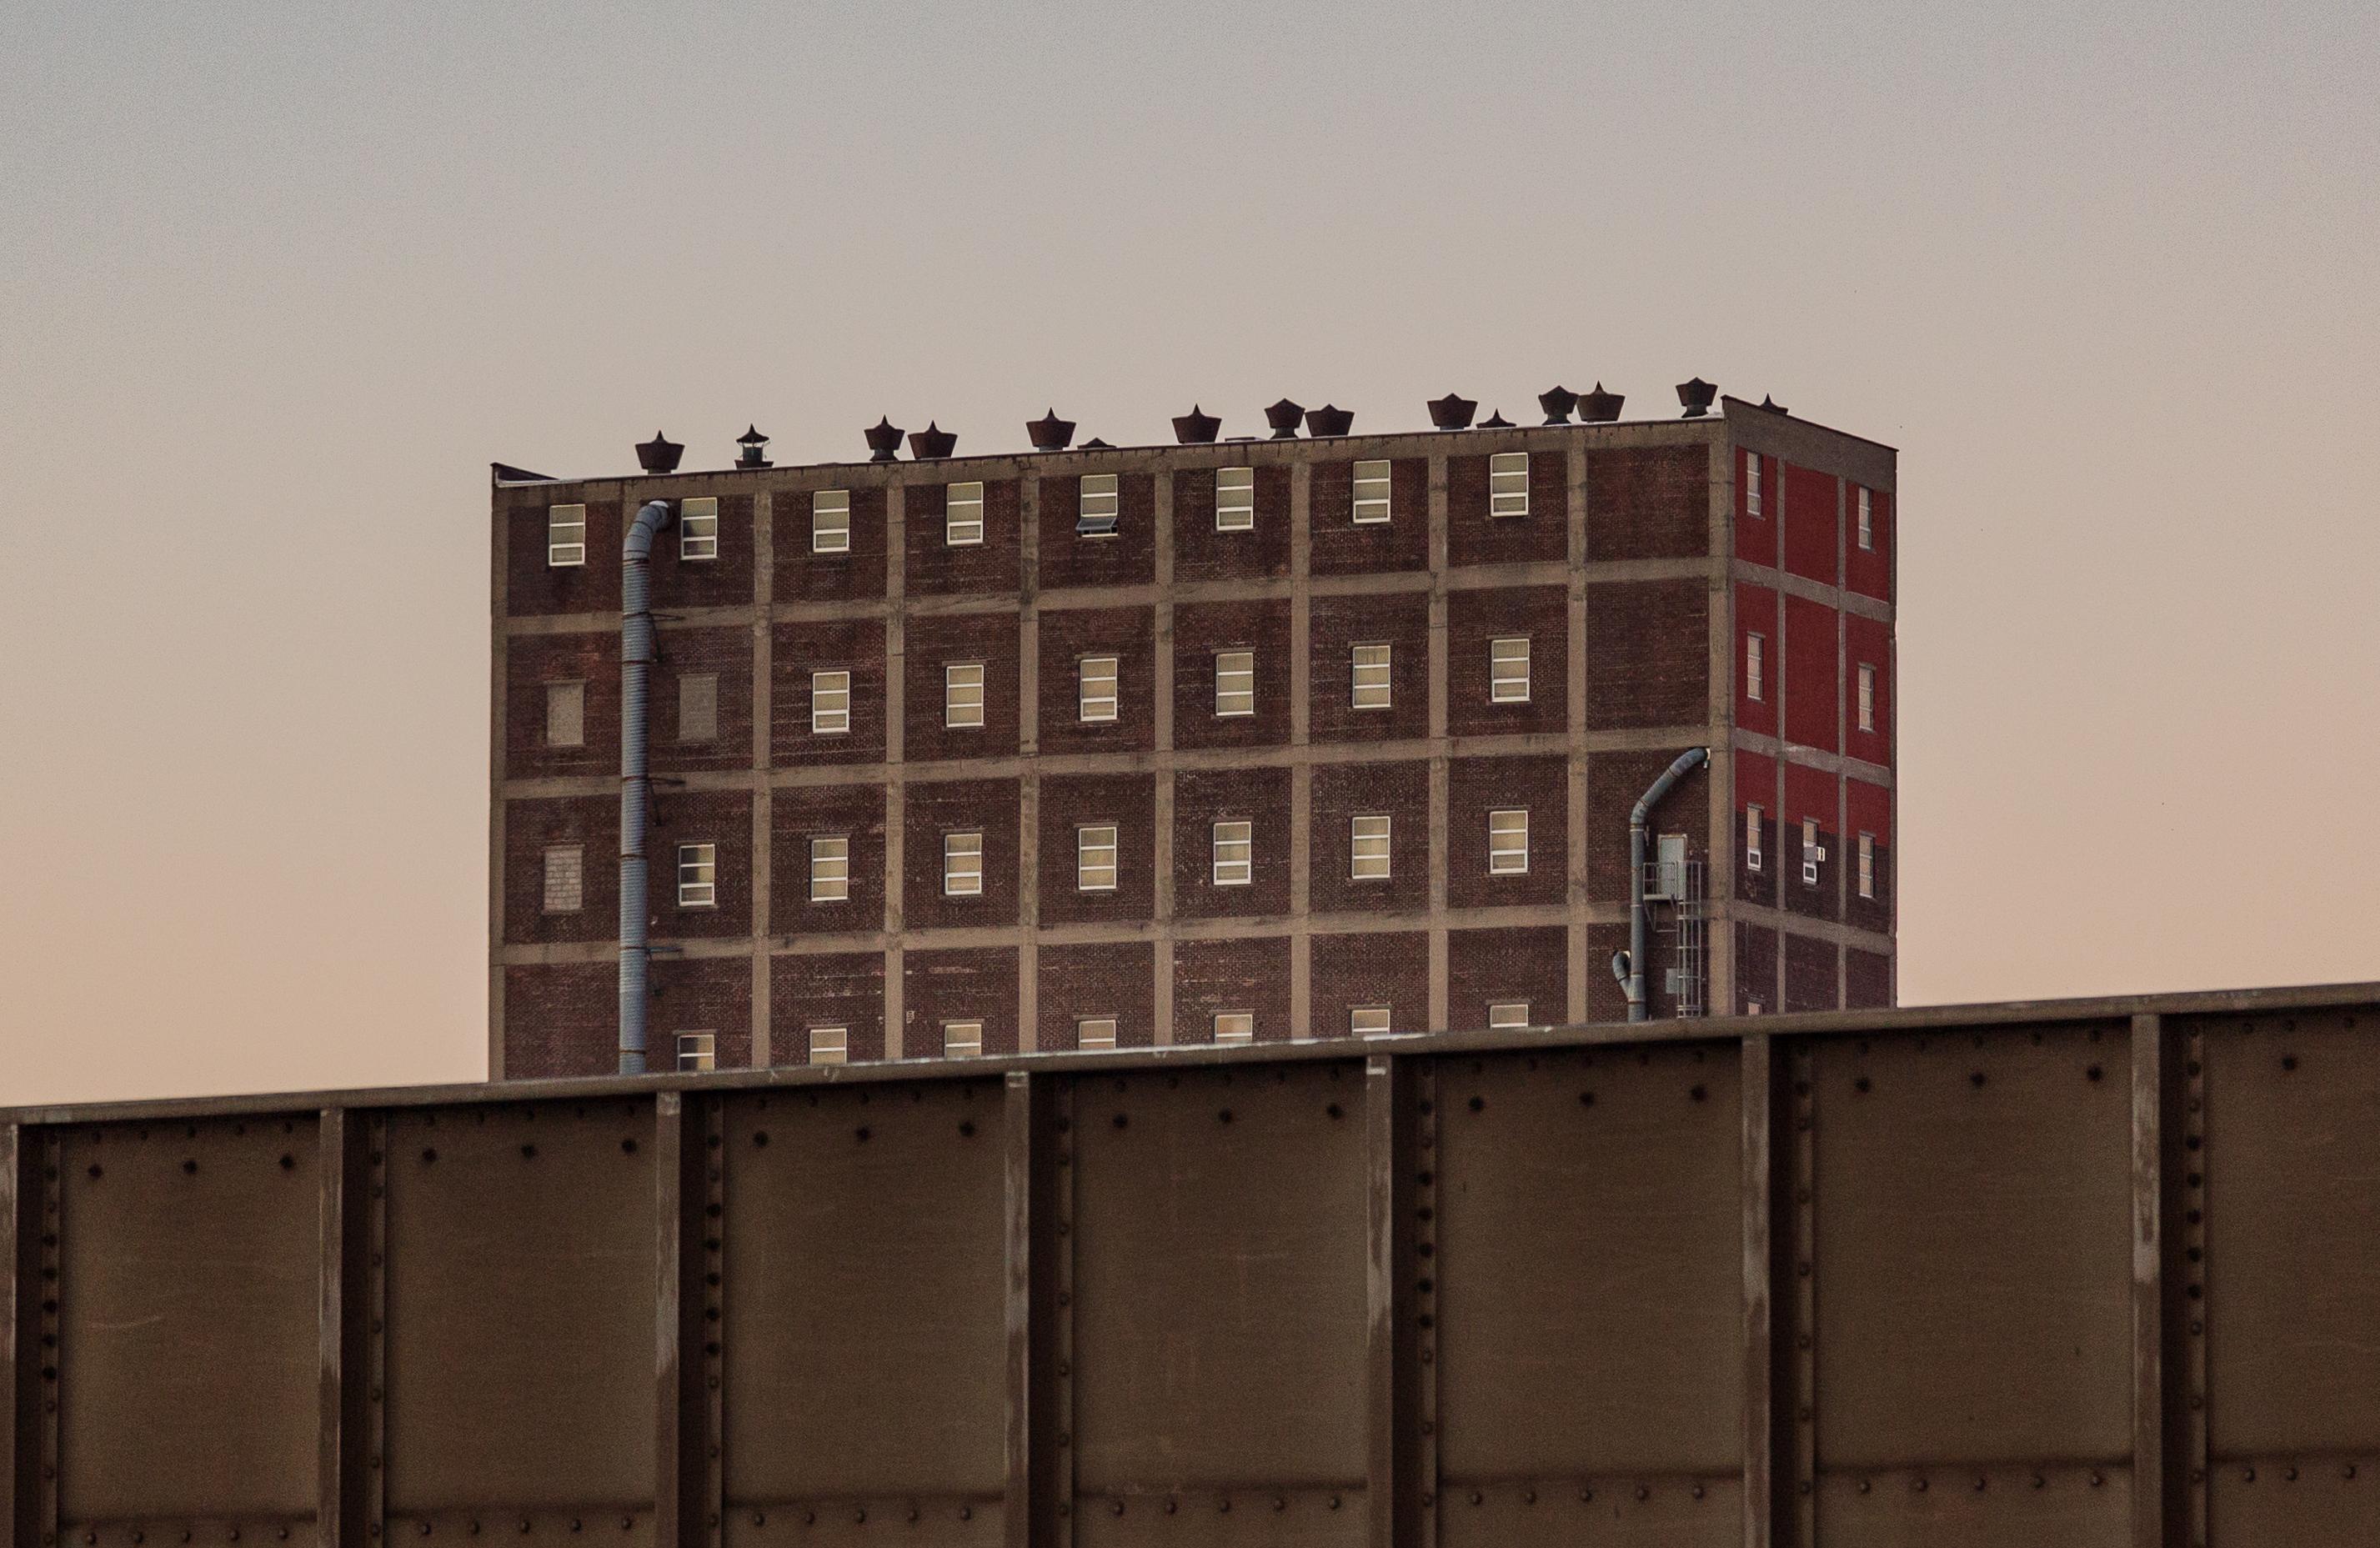 File:Humboldt Industrial, North Minneapolis ADM - Cargill Grain